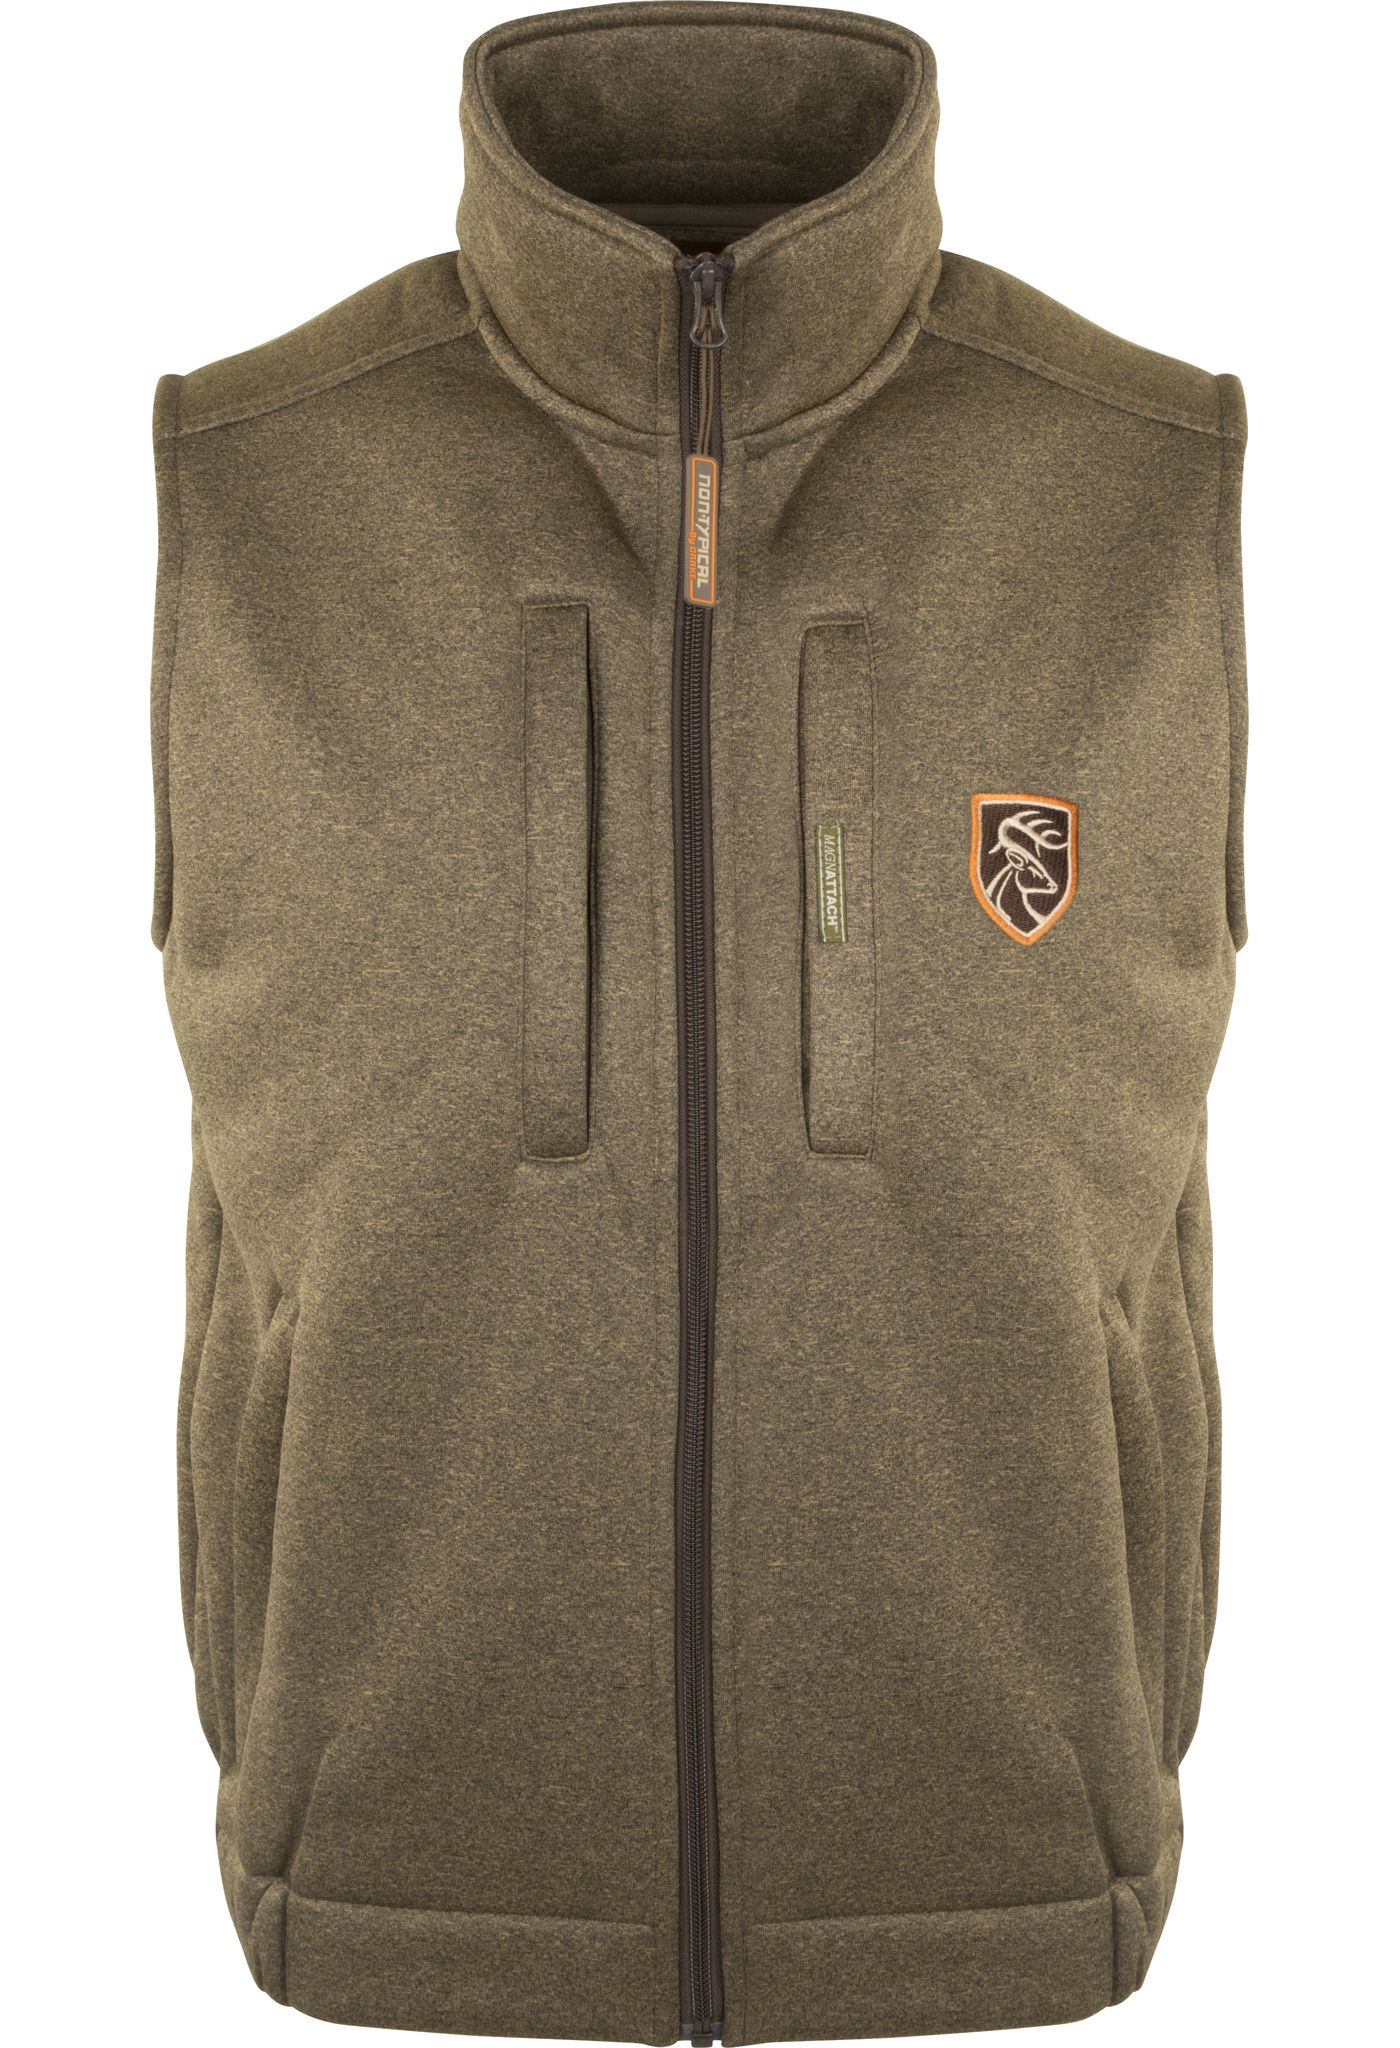 Drake Waterfowl Men's Non-Typical Soft Shell Fleece Vest